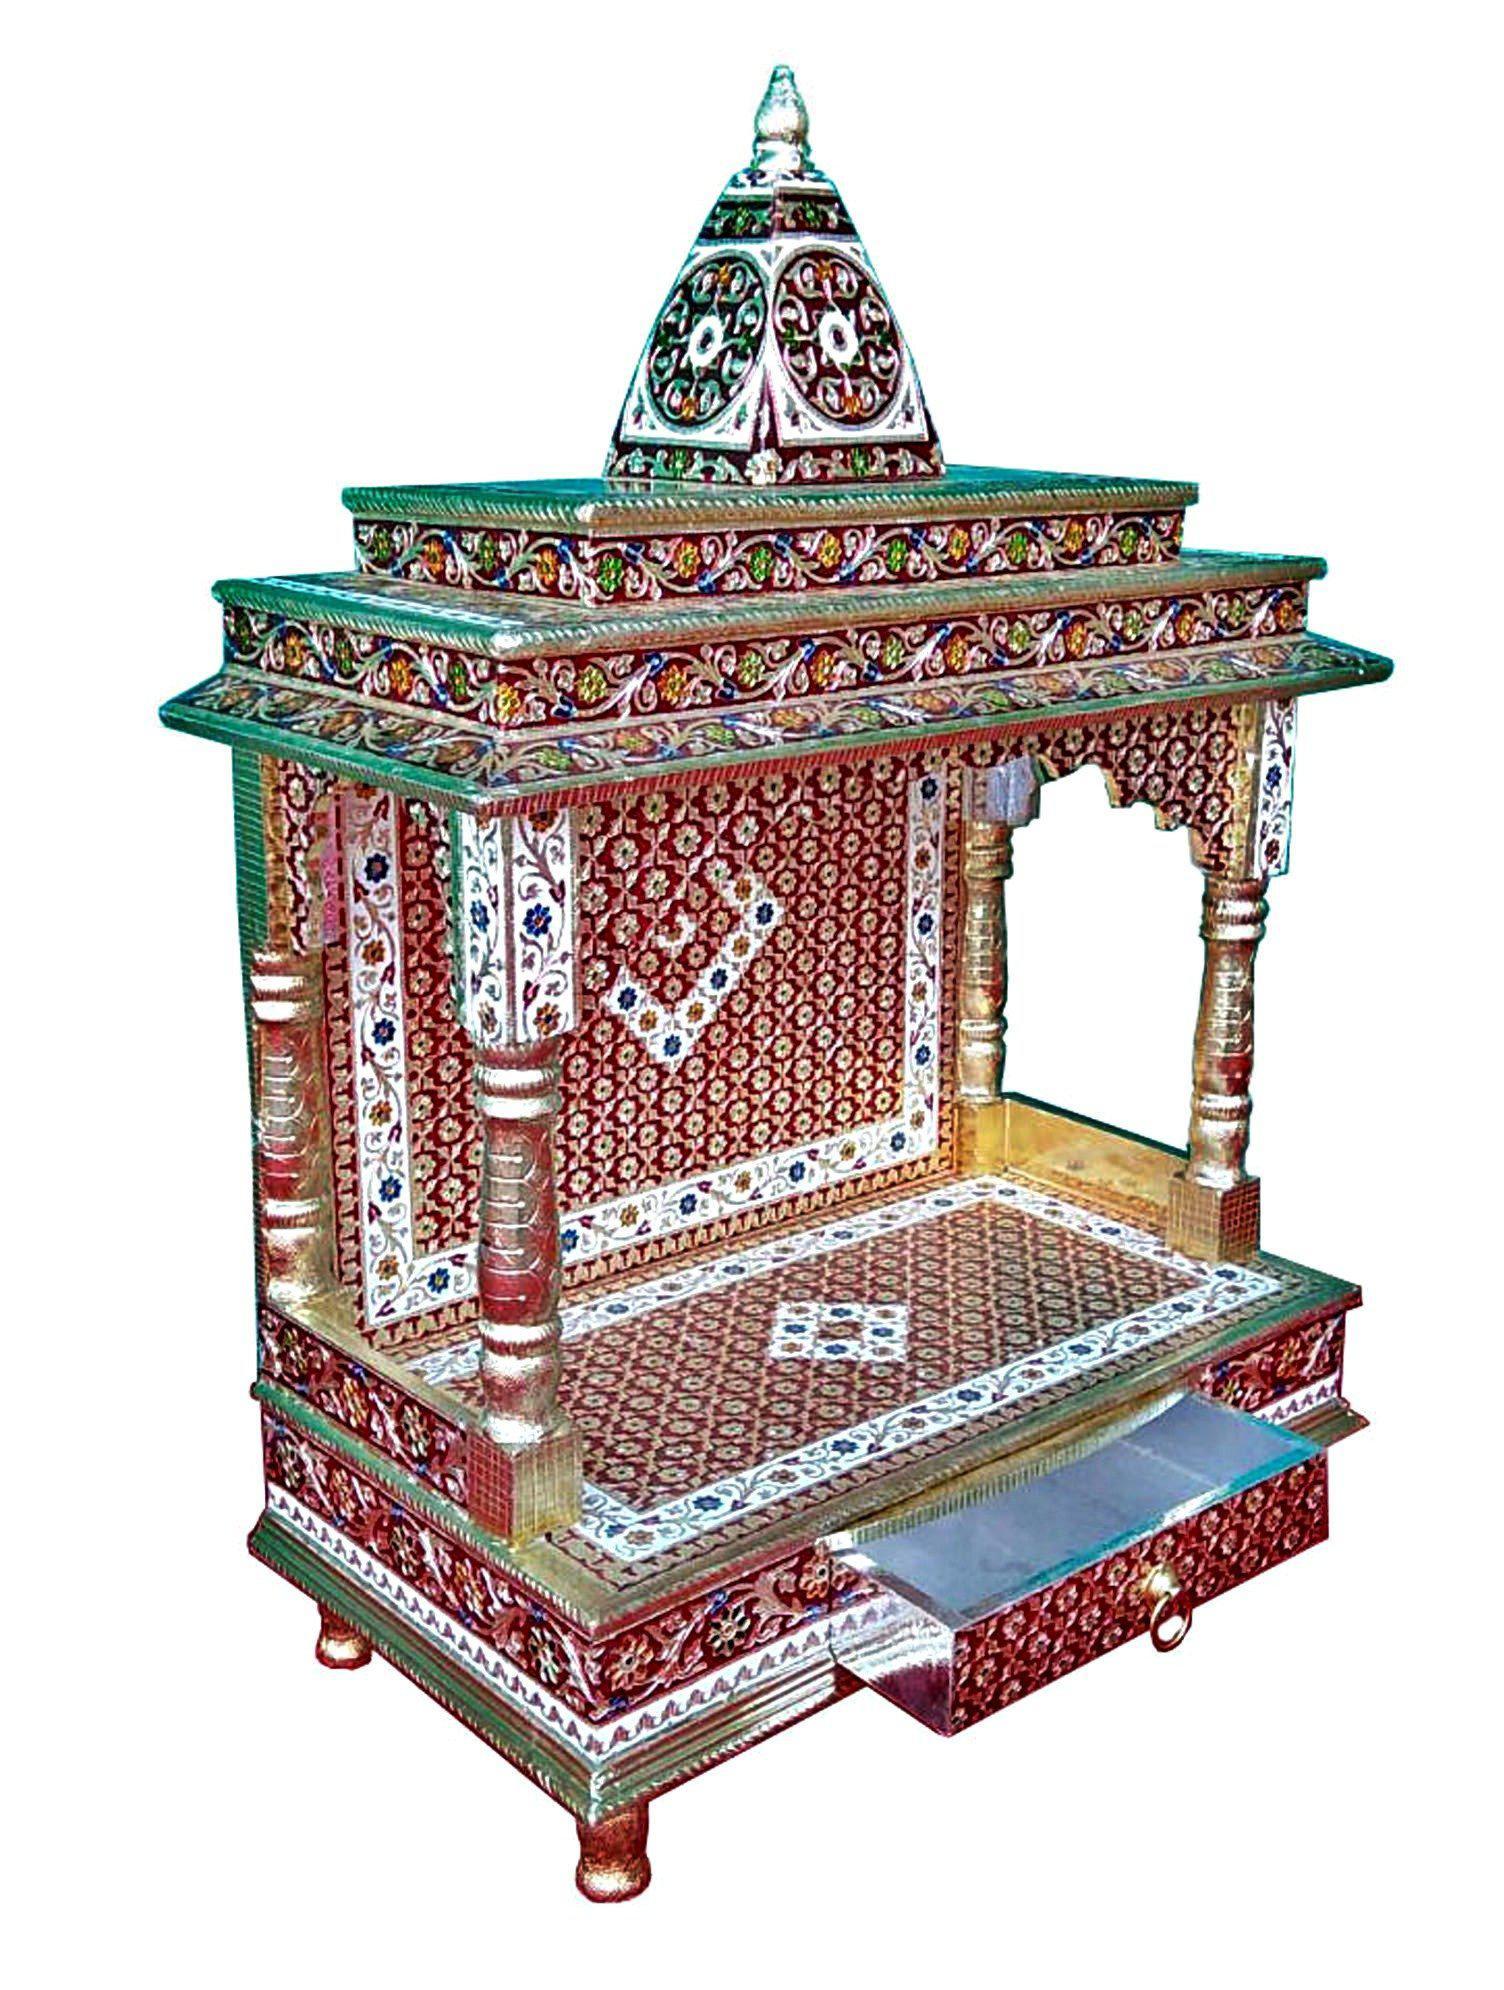 Meenakari Multicolor Home Puja Mandir Hindu Temple Mandapam Altar   Image 2  Of 3